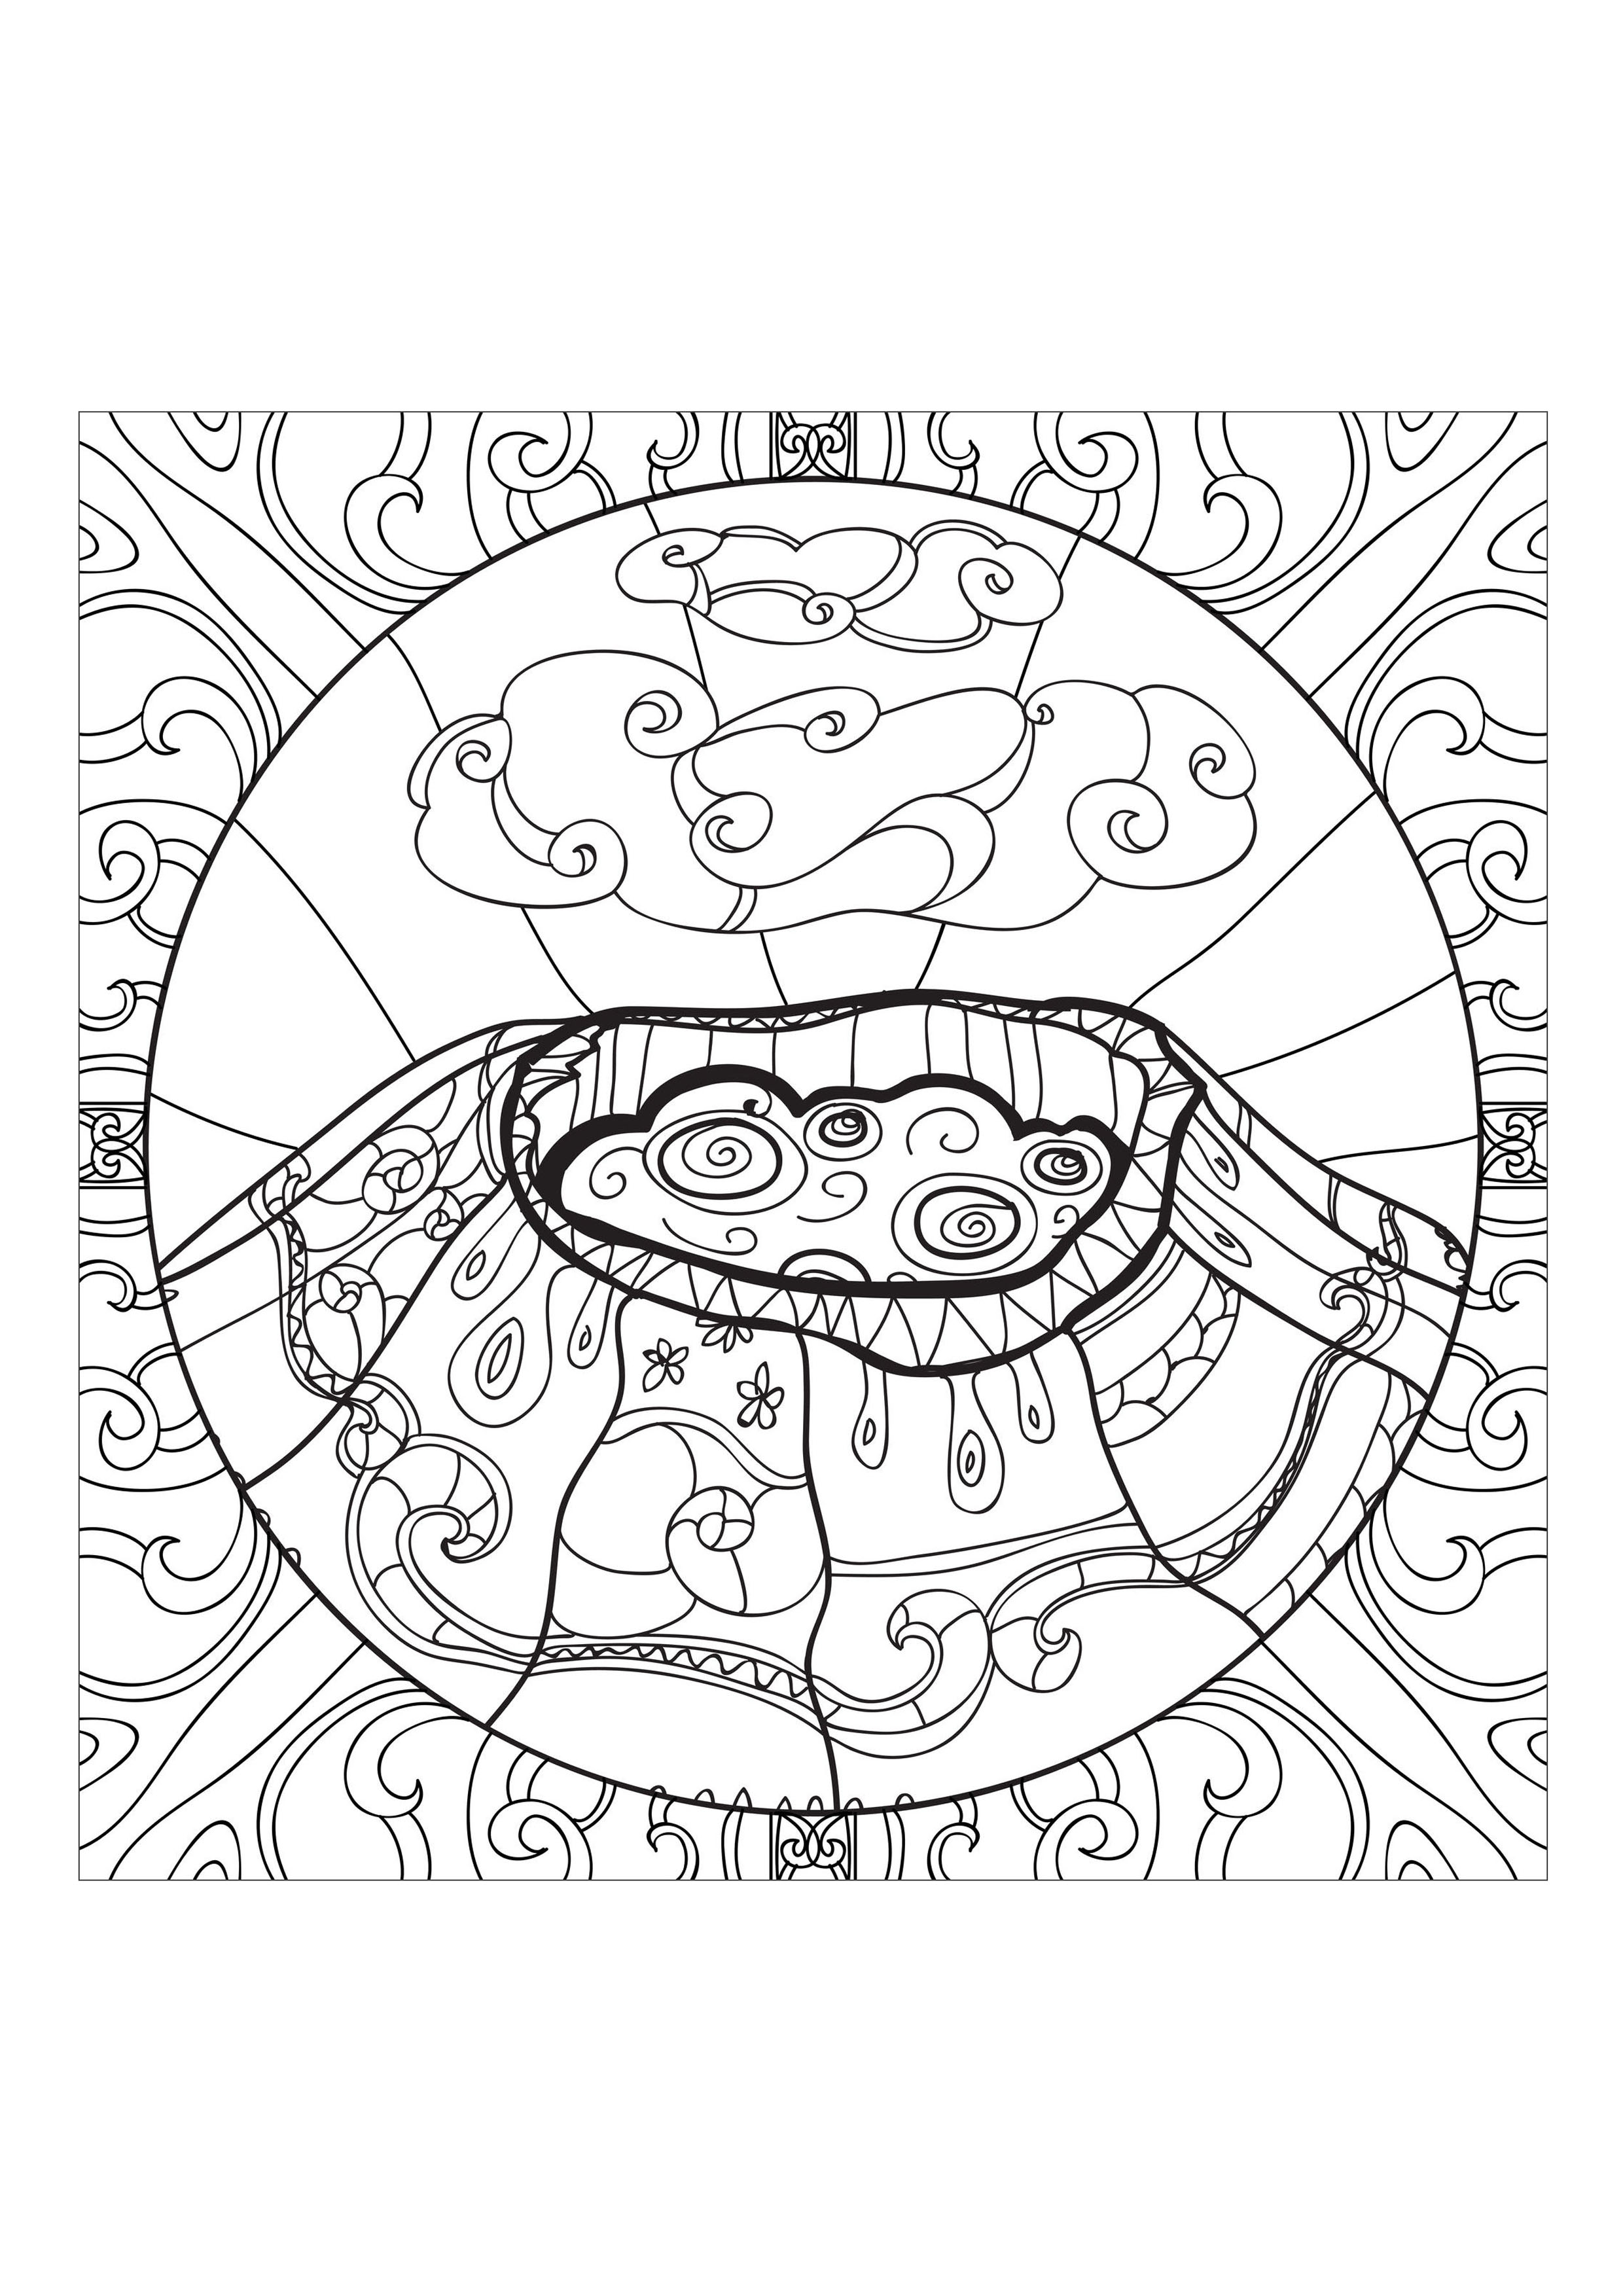 Coloriage Mandala Volcan.Volcan 1 Anti Stress Art Therapie Coloriages Difficiles Pour